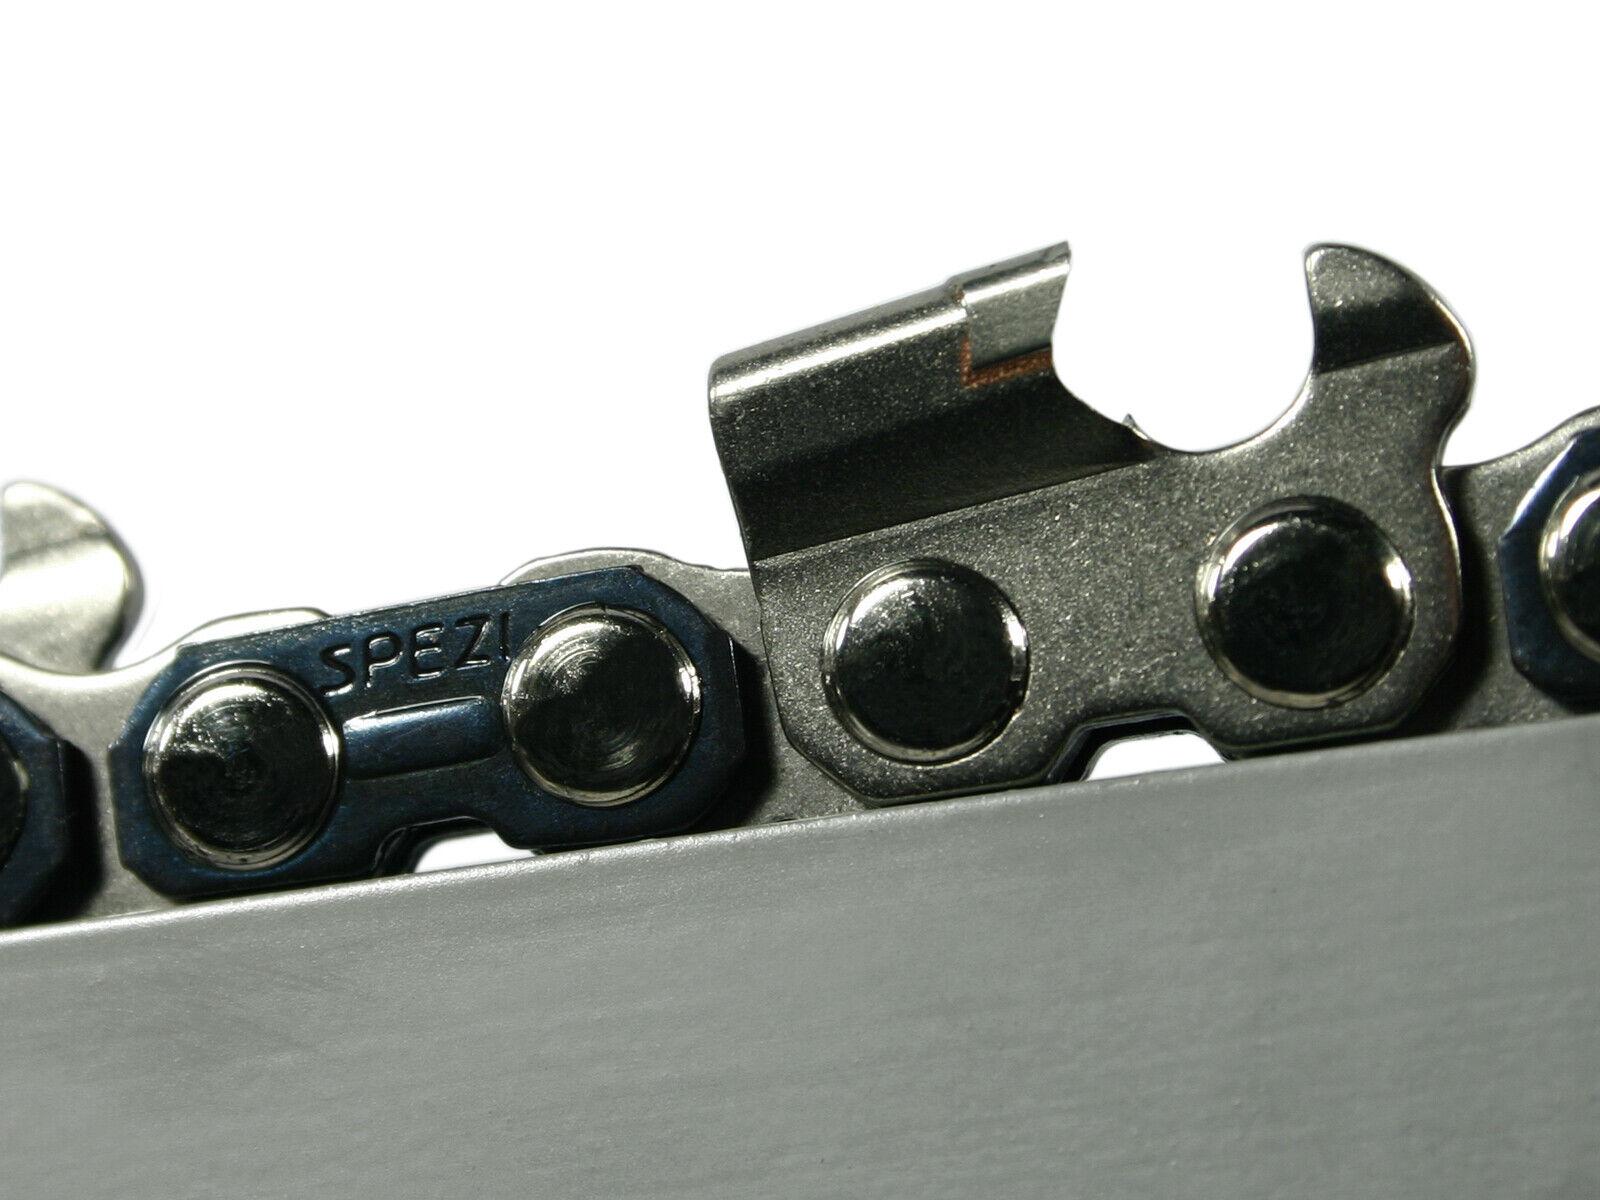 Metal duro cadena sierra adecuado para Husqvarna 77 60 cm 3 8  84 TG 1,5 mm Cochebide